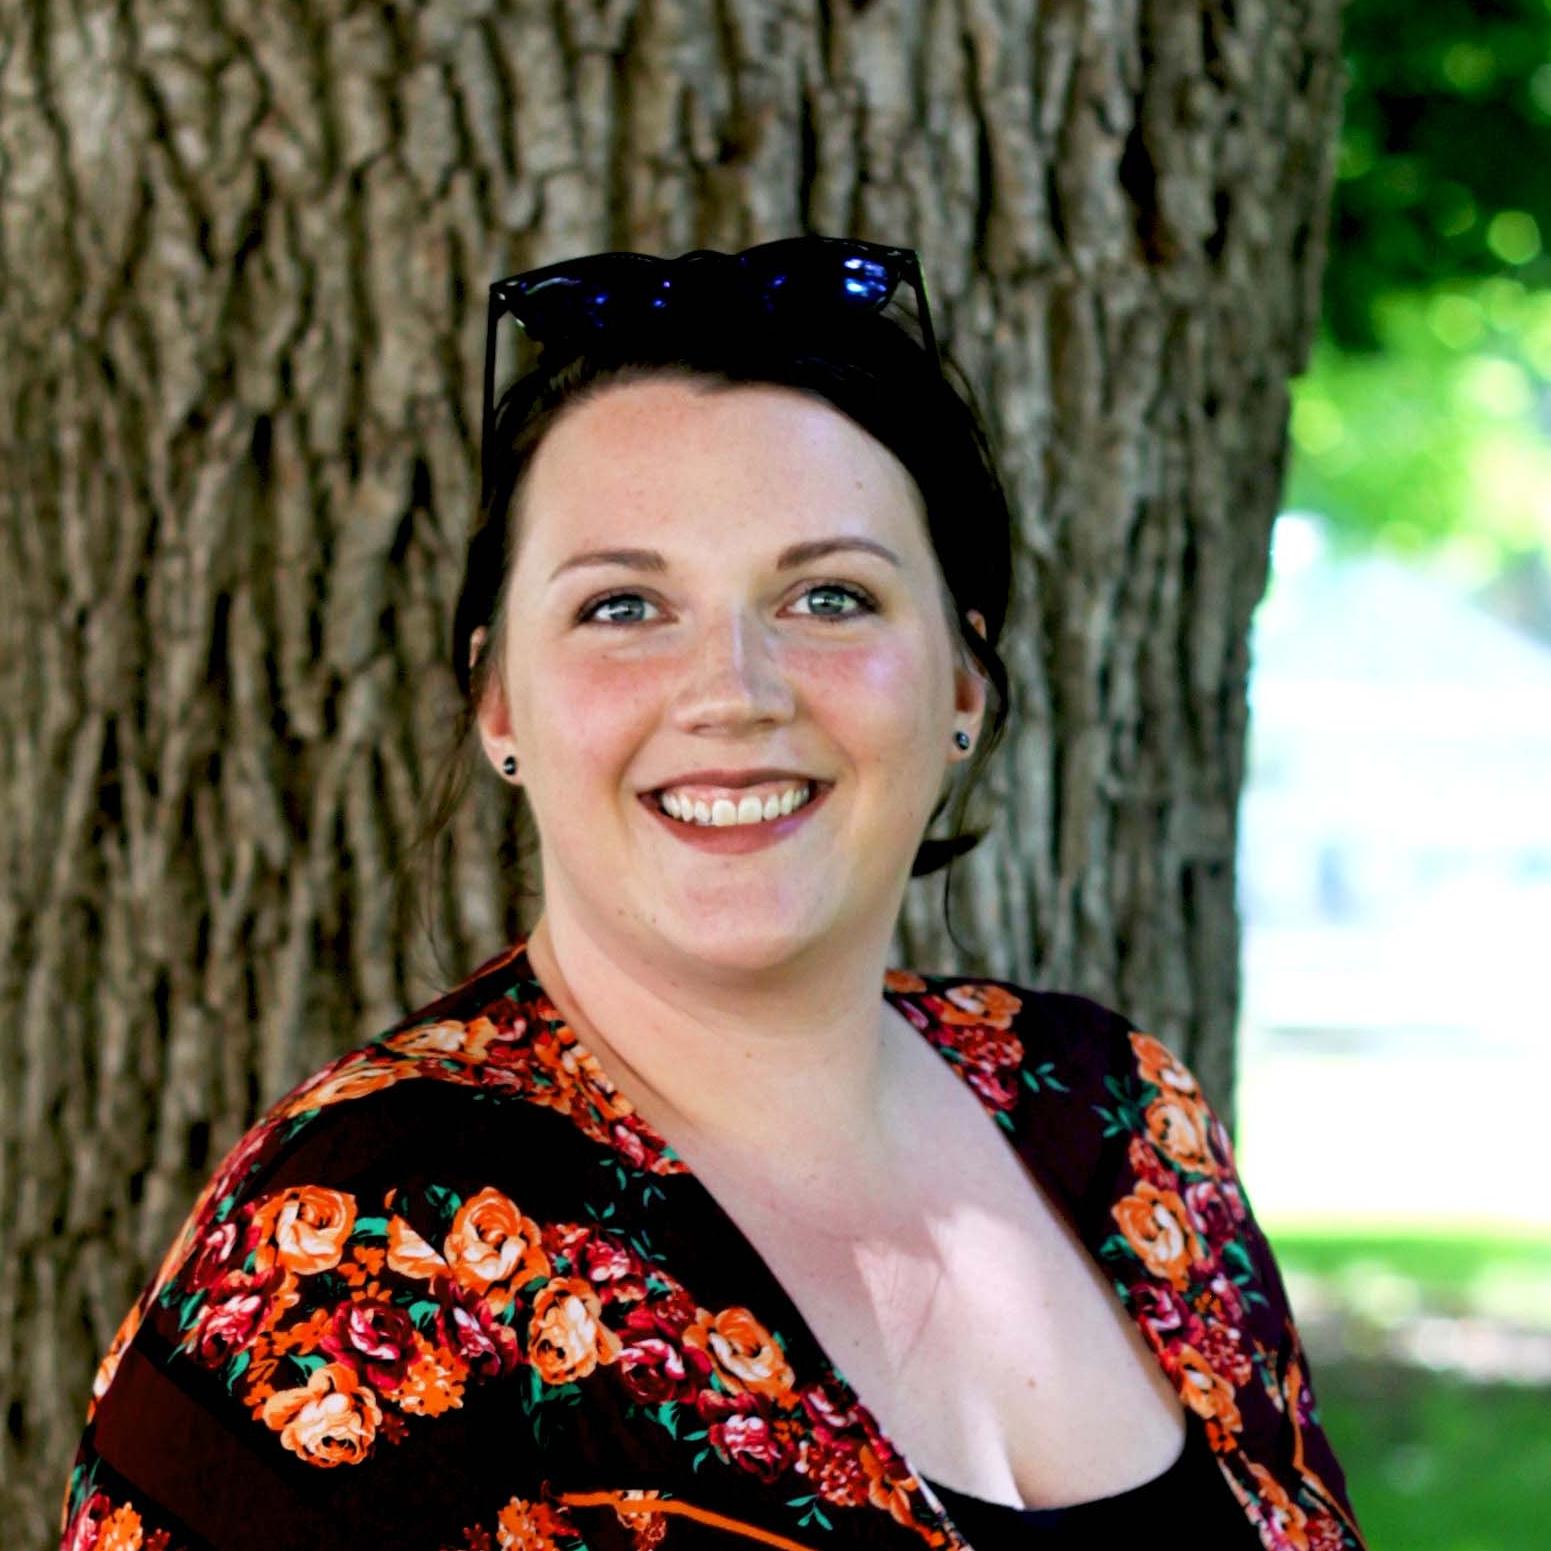 Paige Furniss